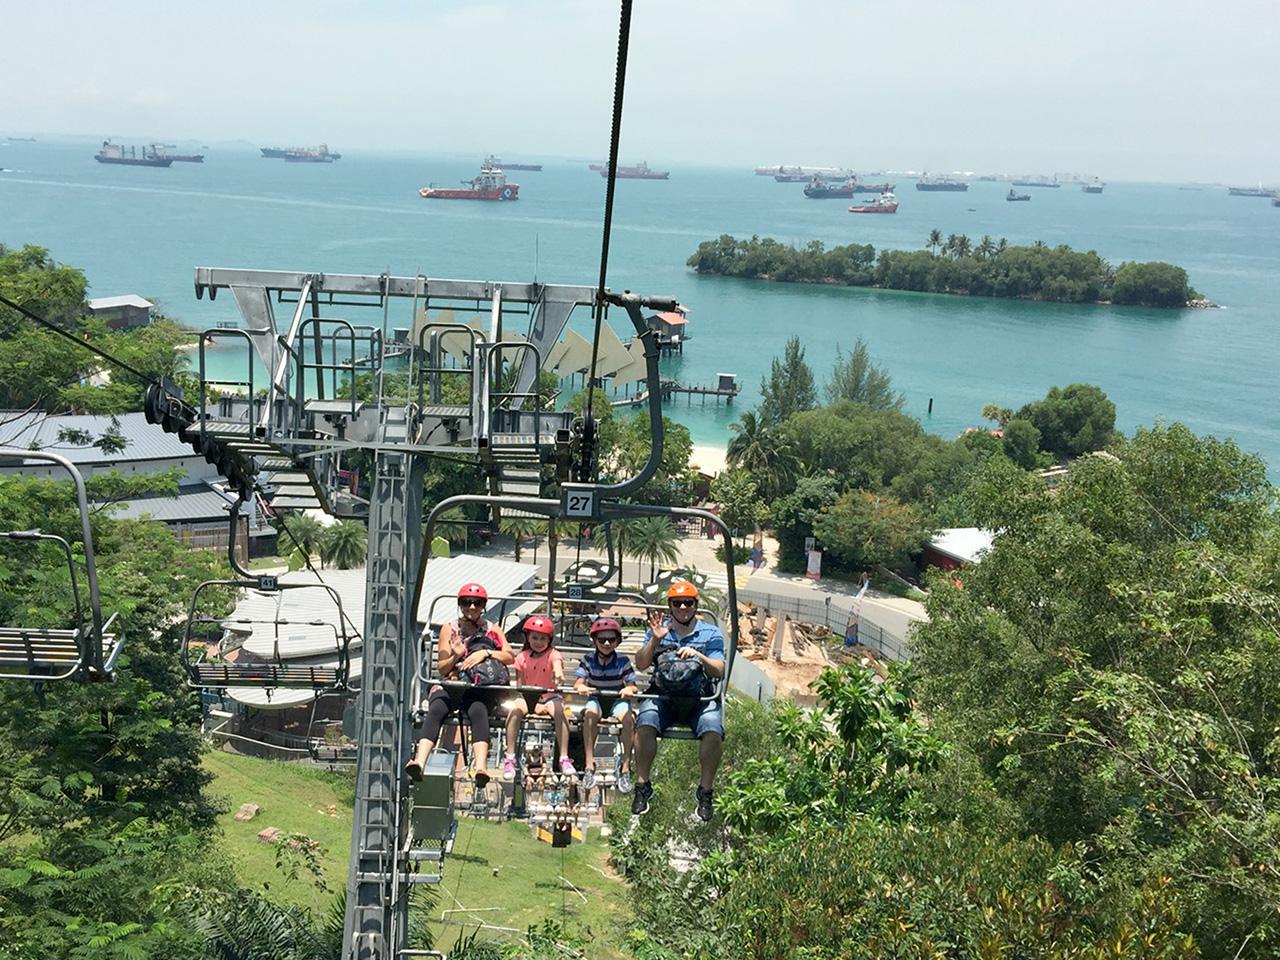 Singapore Family Holidays: 6 Reasons Why Singapore Should Be